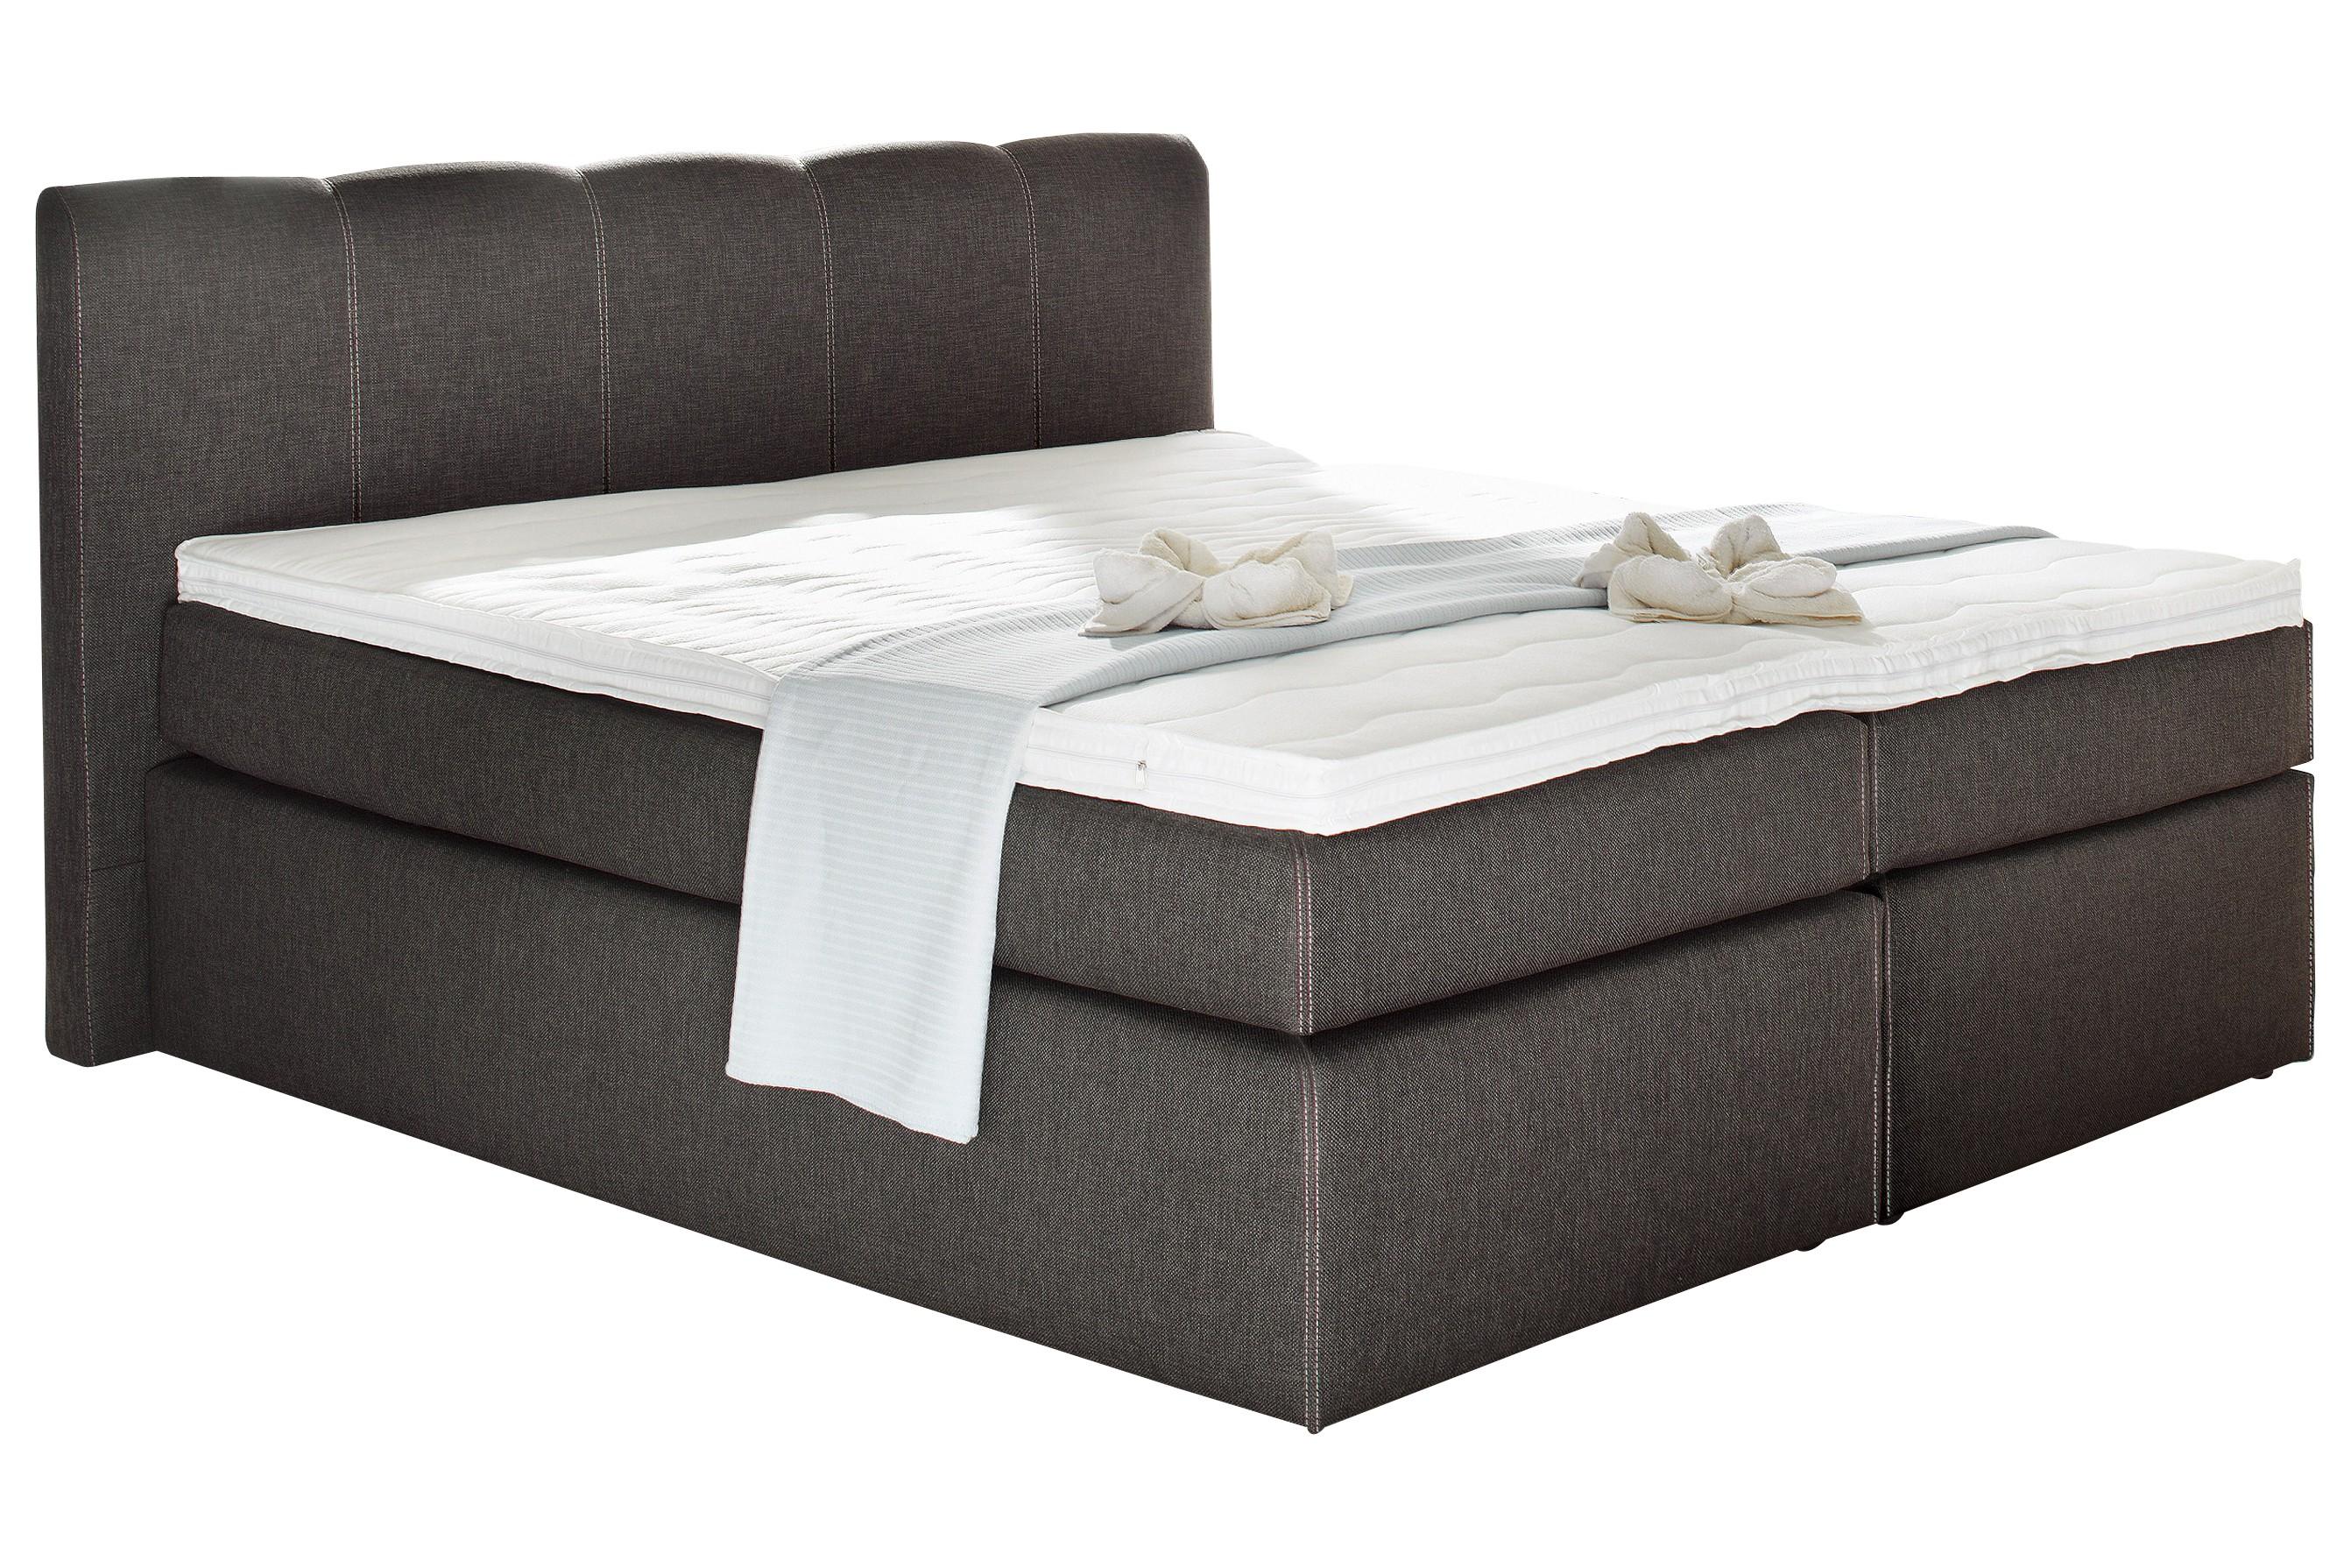 boxspringbett havena 180x200 cm braun. Black Bedroom Furniture Sets. Home Design Ideas